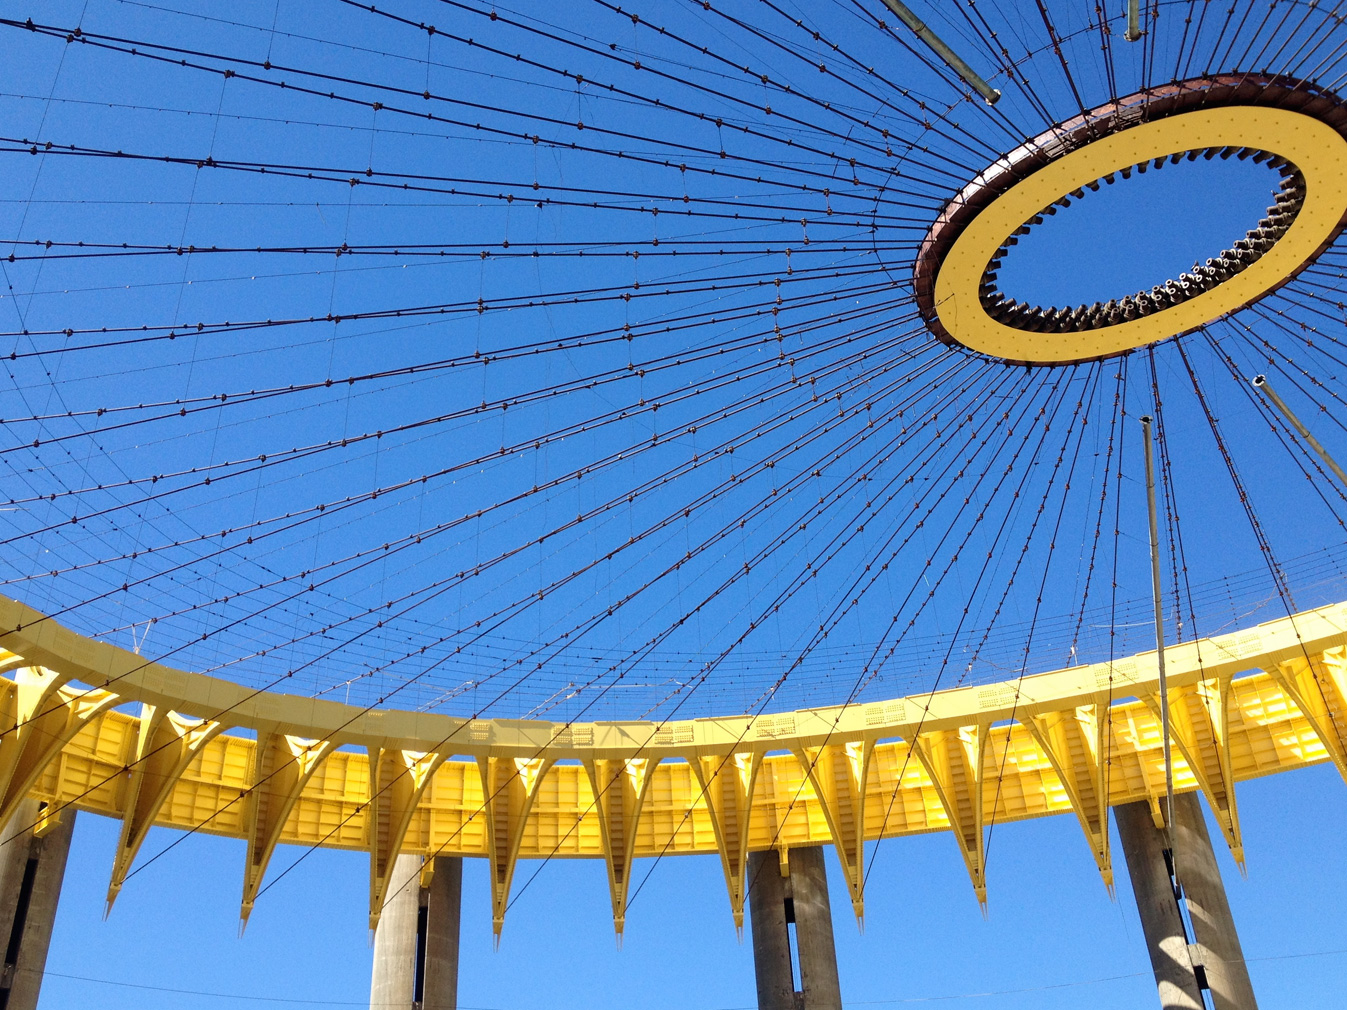 Philip Johnson's space age World's Fair pavilion is getting a refurb